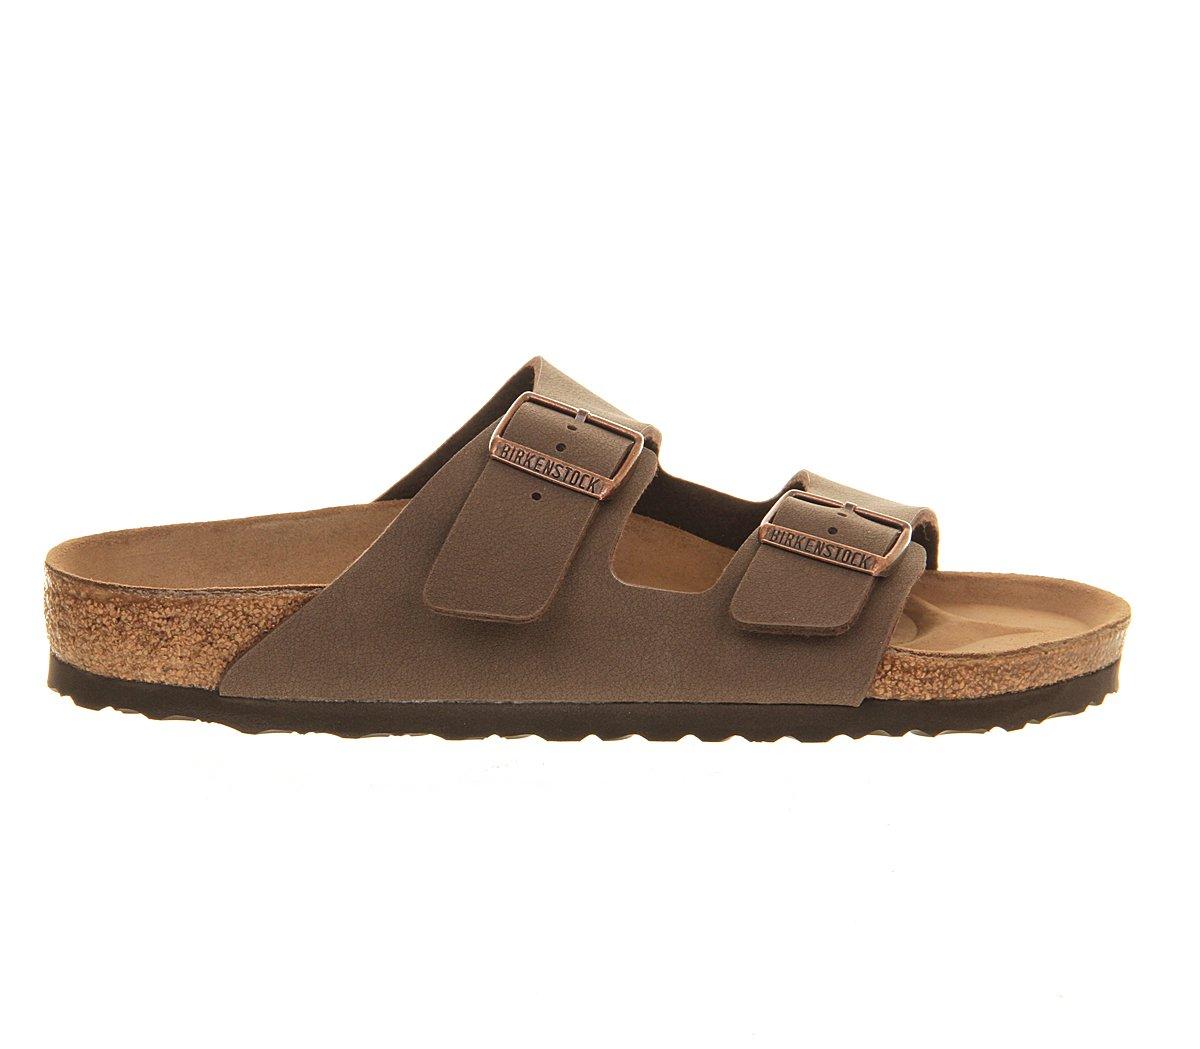 Birkenstock Arizona Birko Flor Sandals 11 D(M) US Mocca